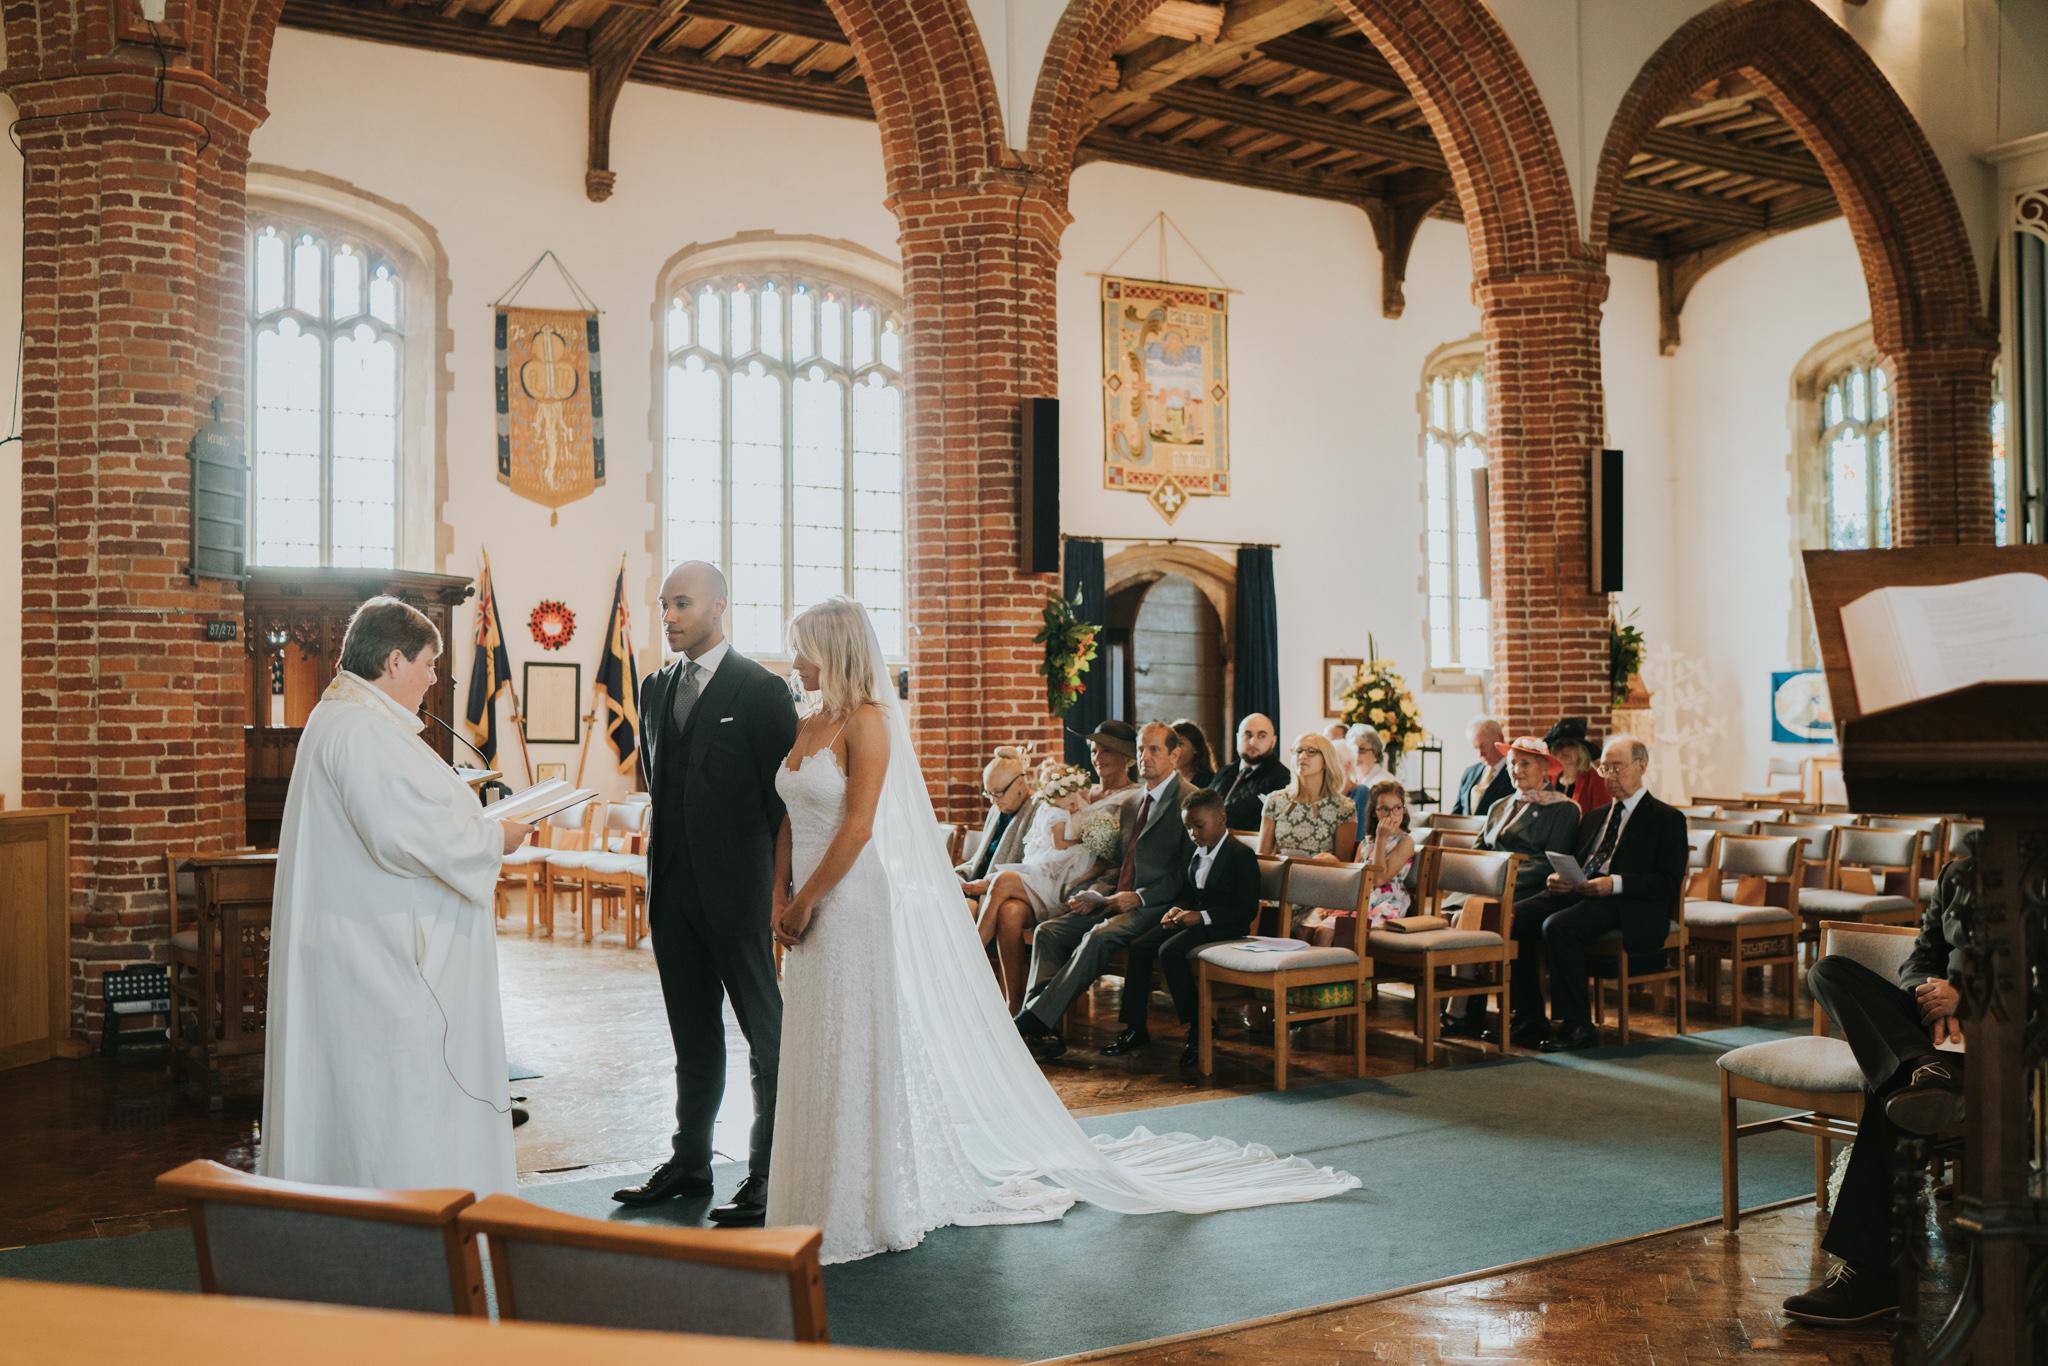 Sarah-Alex-Wivenhoe-House-St-Osyth-Church-Intimate-Wedding-Grace-Elizabeth-Colchester-Essex-Alternative-Wedding-Lifestyle-Photographer (1 of 3).jpg